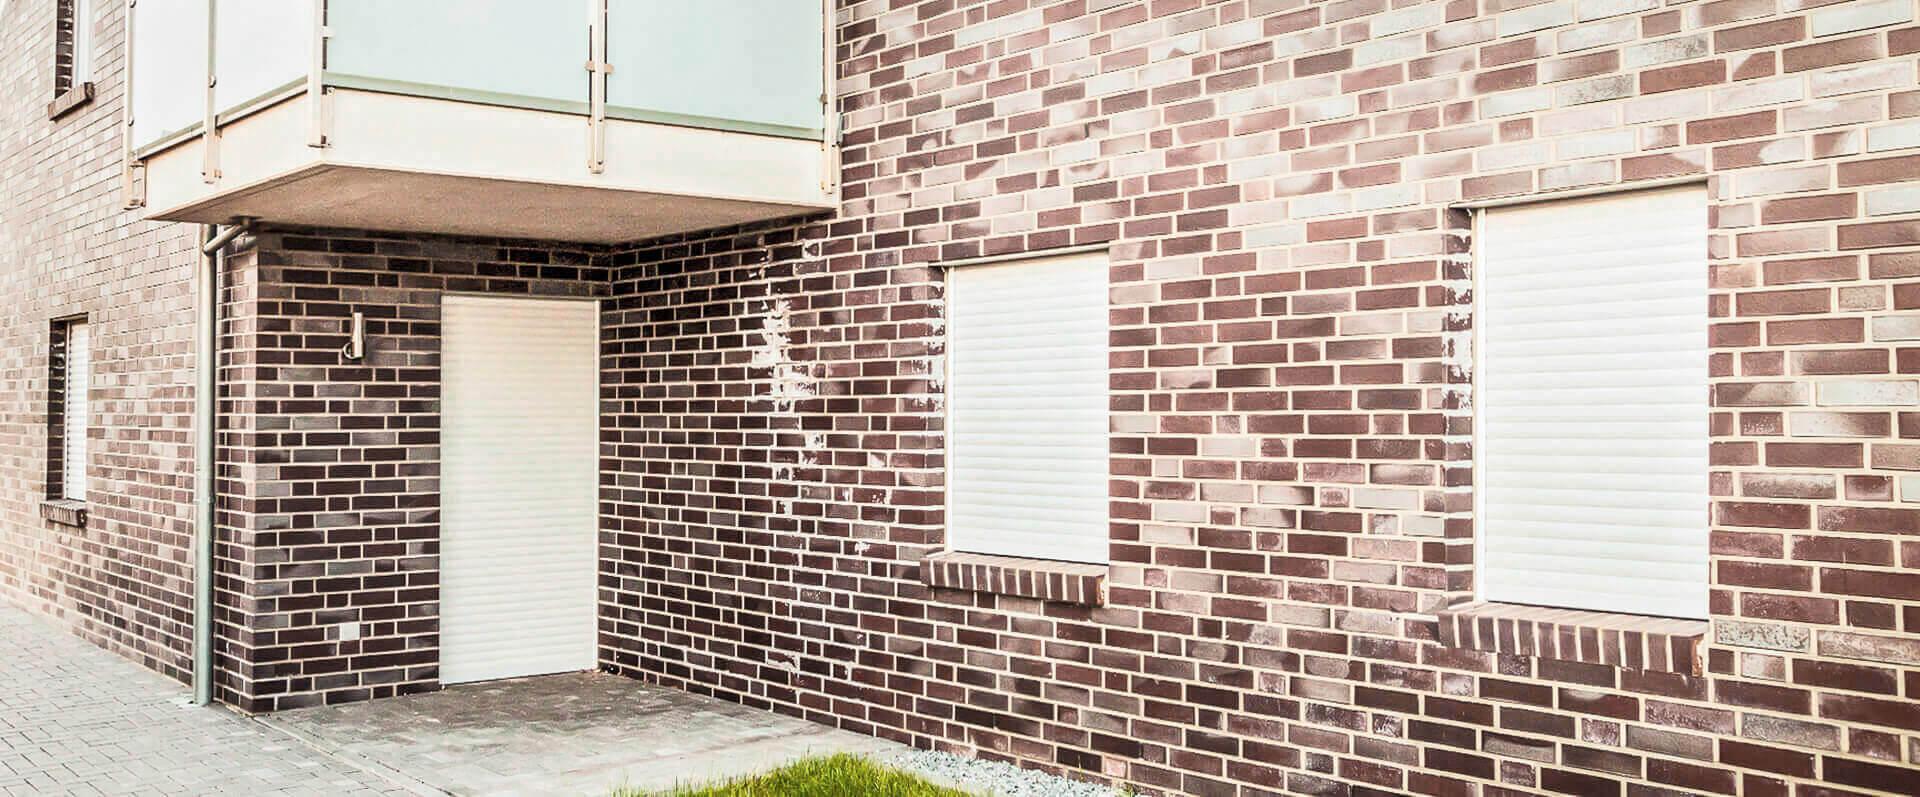 Rollladen-Roma-Jalousien-Sonnenschutz-HG-Raumdesign